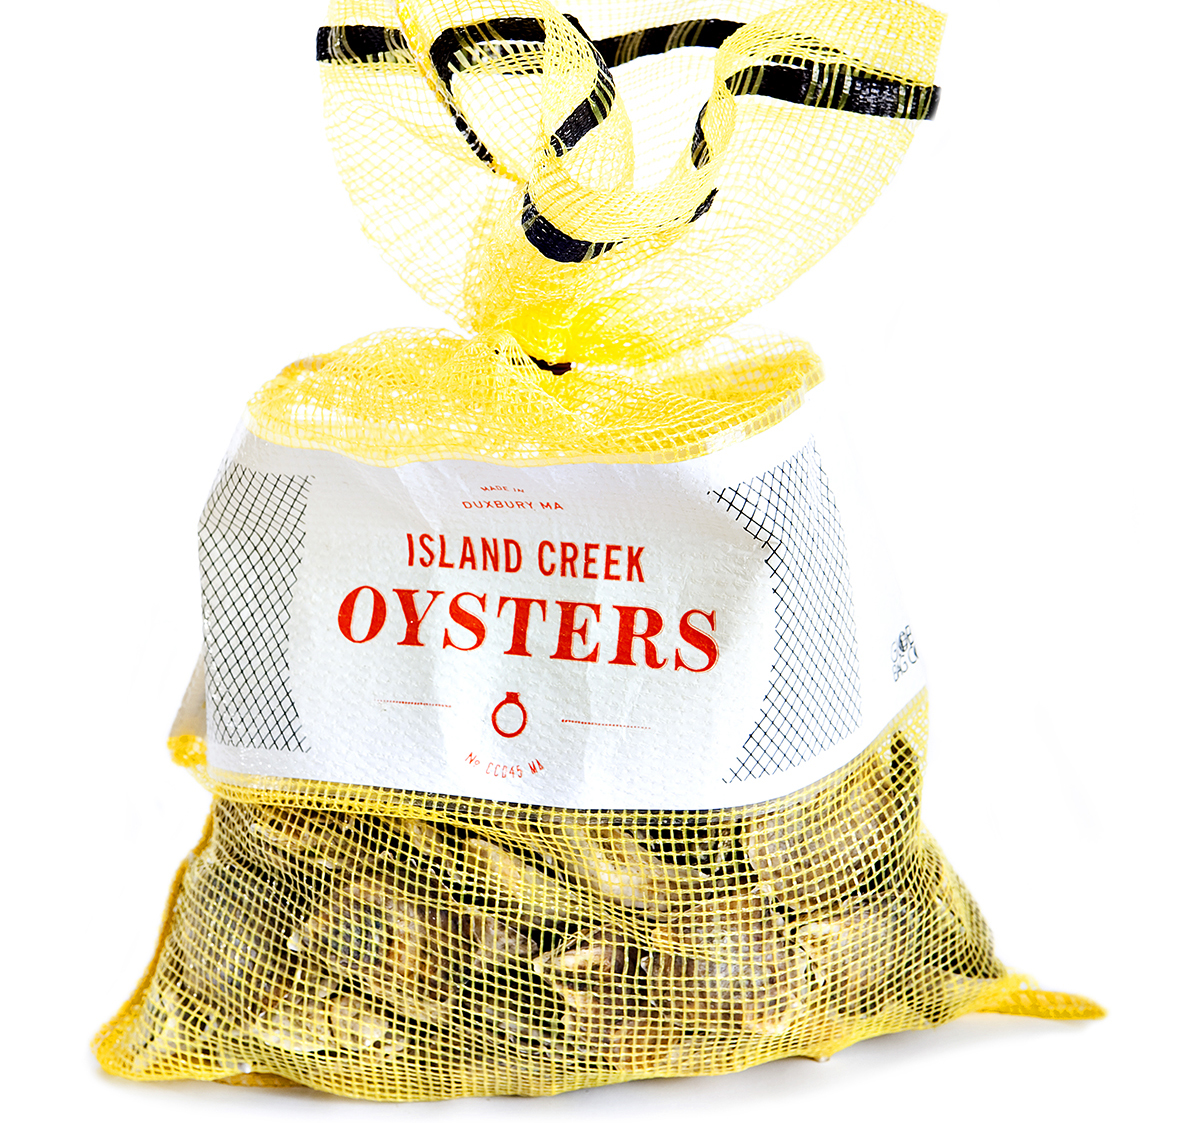 Island Creek Oysters. / Photo provided